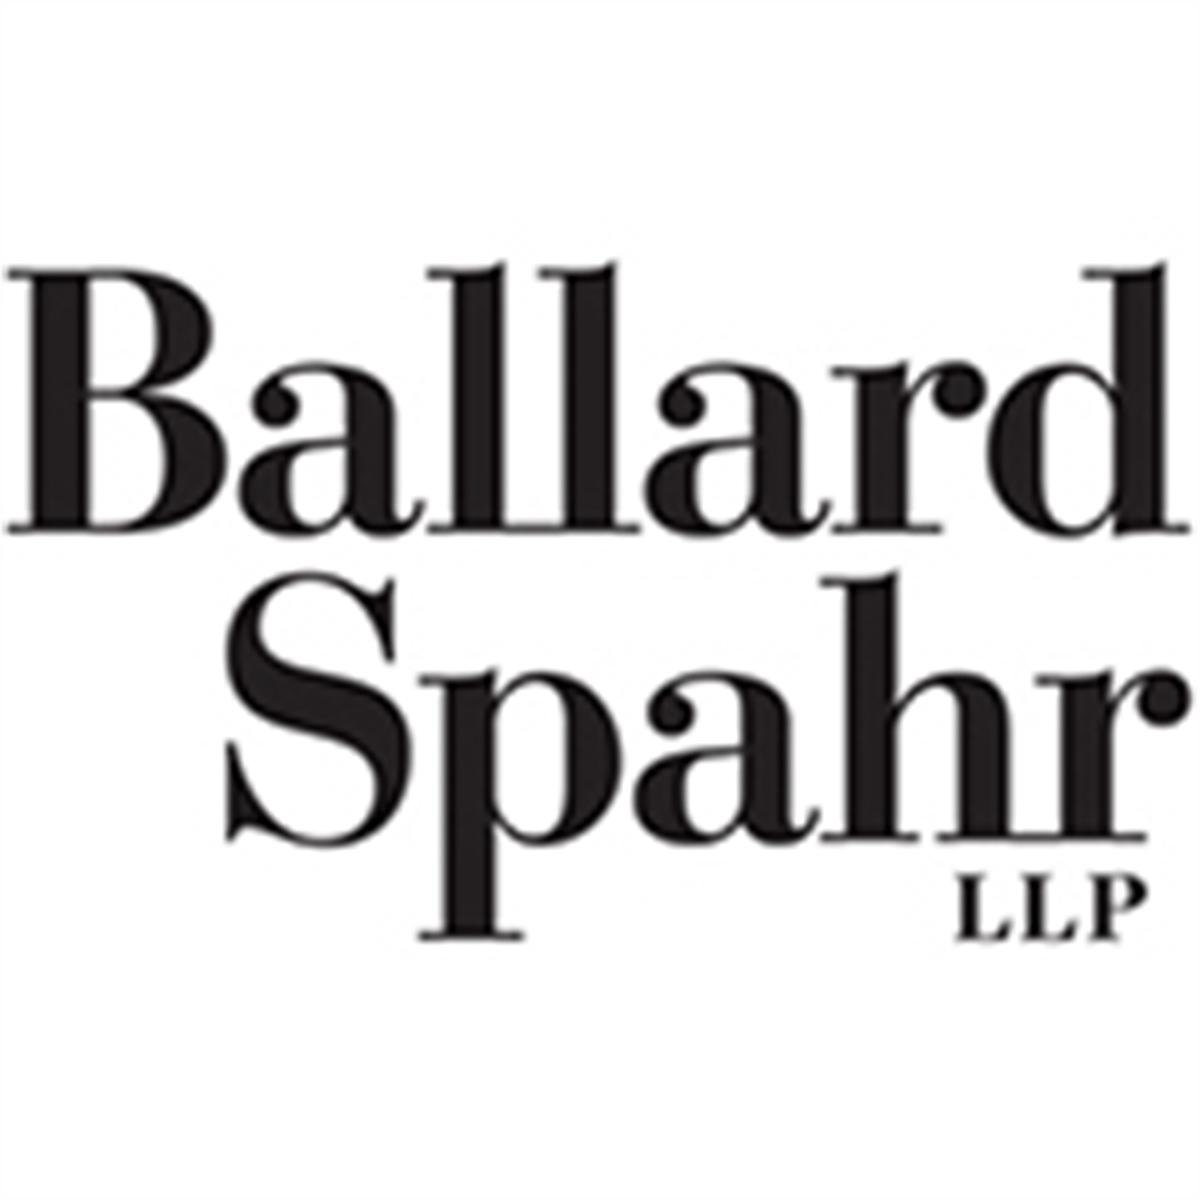 OSHA Issues Final Rules for Online Posting of Injury and Illness Data, Discouraging Retaliation | Ballard Spahr LLP - JDSupra